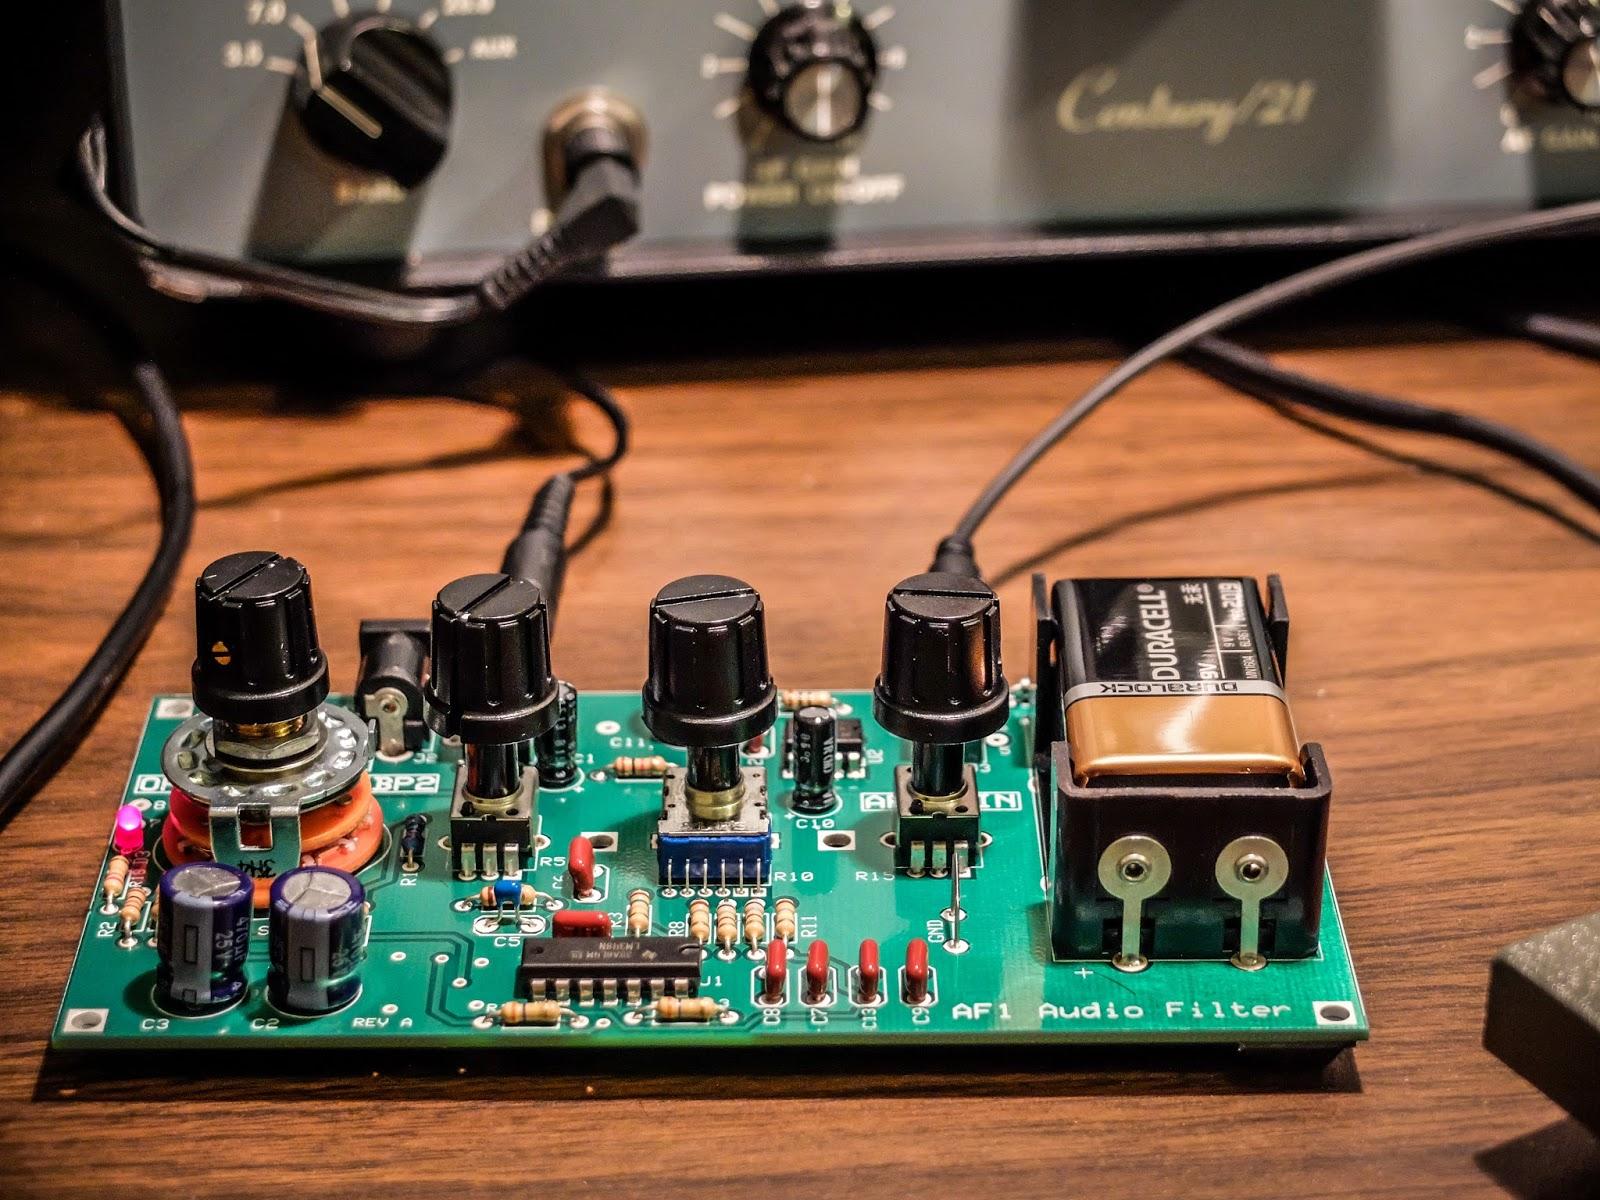 Making use of elecraft mini module kits amateurradio af1 audio filter making crowded band operations pleasurable freerunsca Images